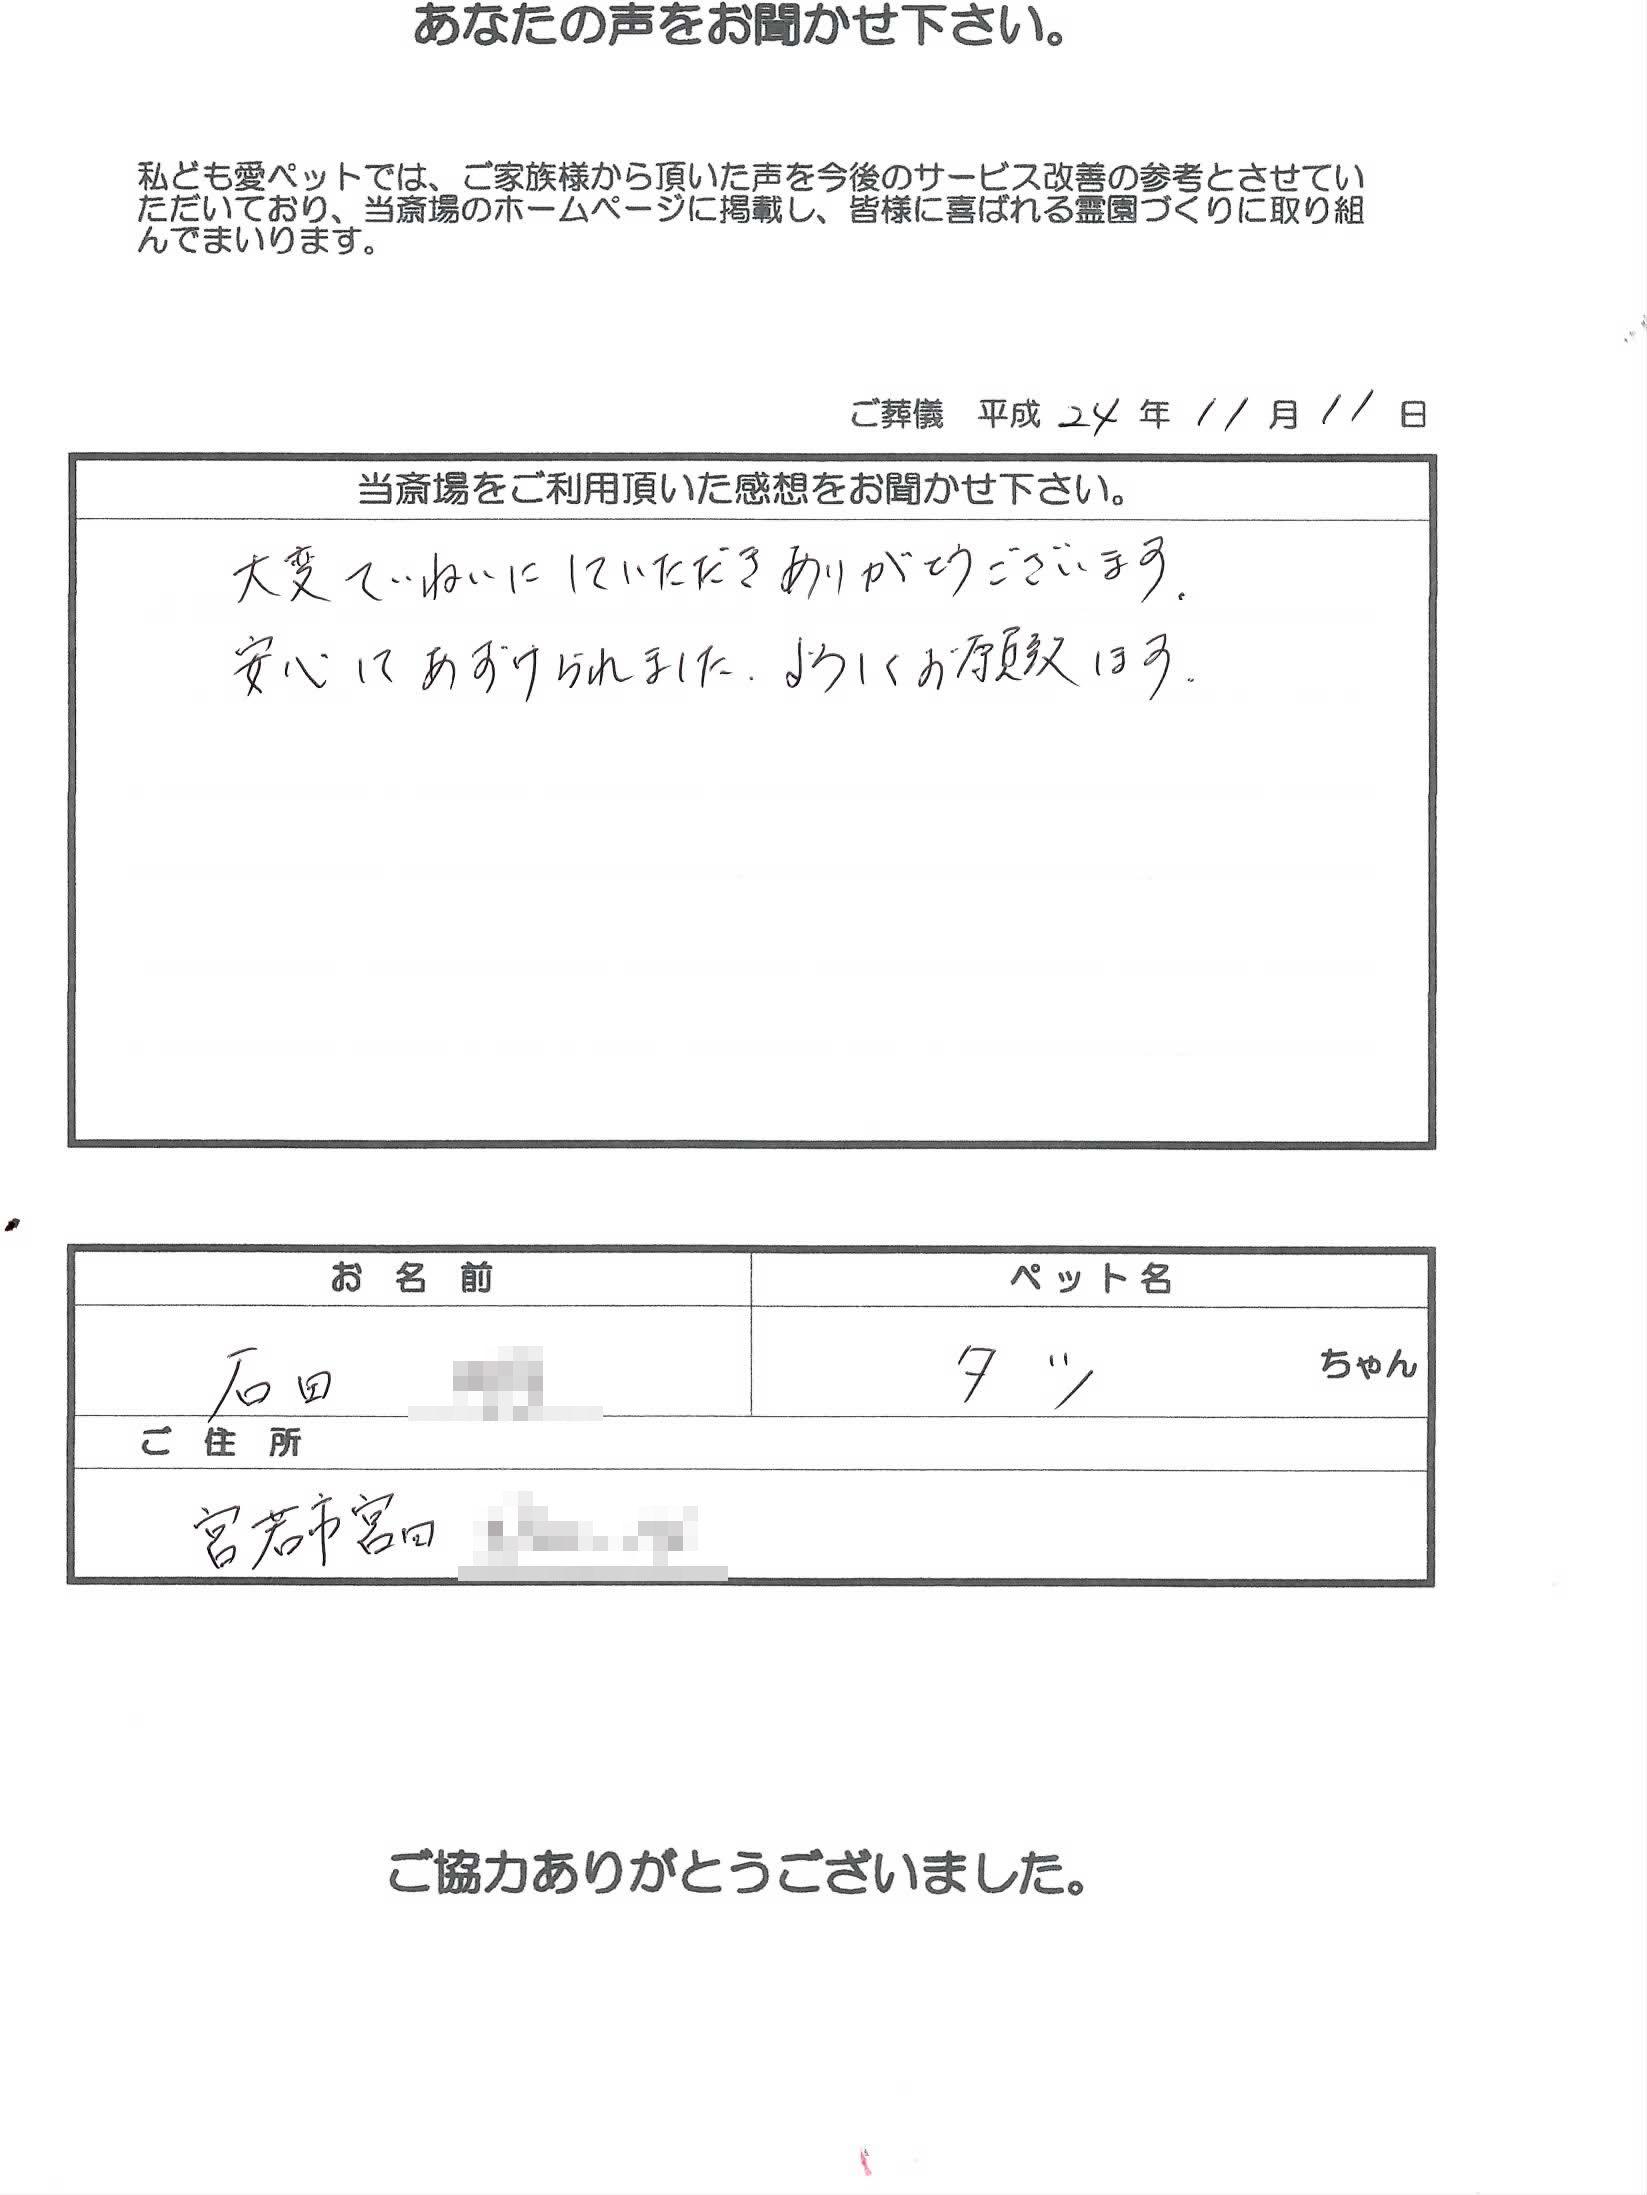 k121111-1.jpg